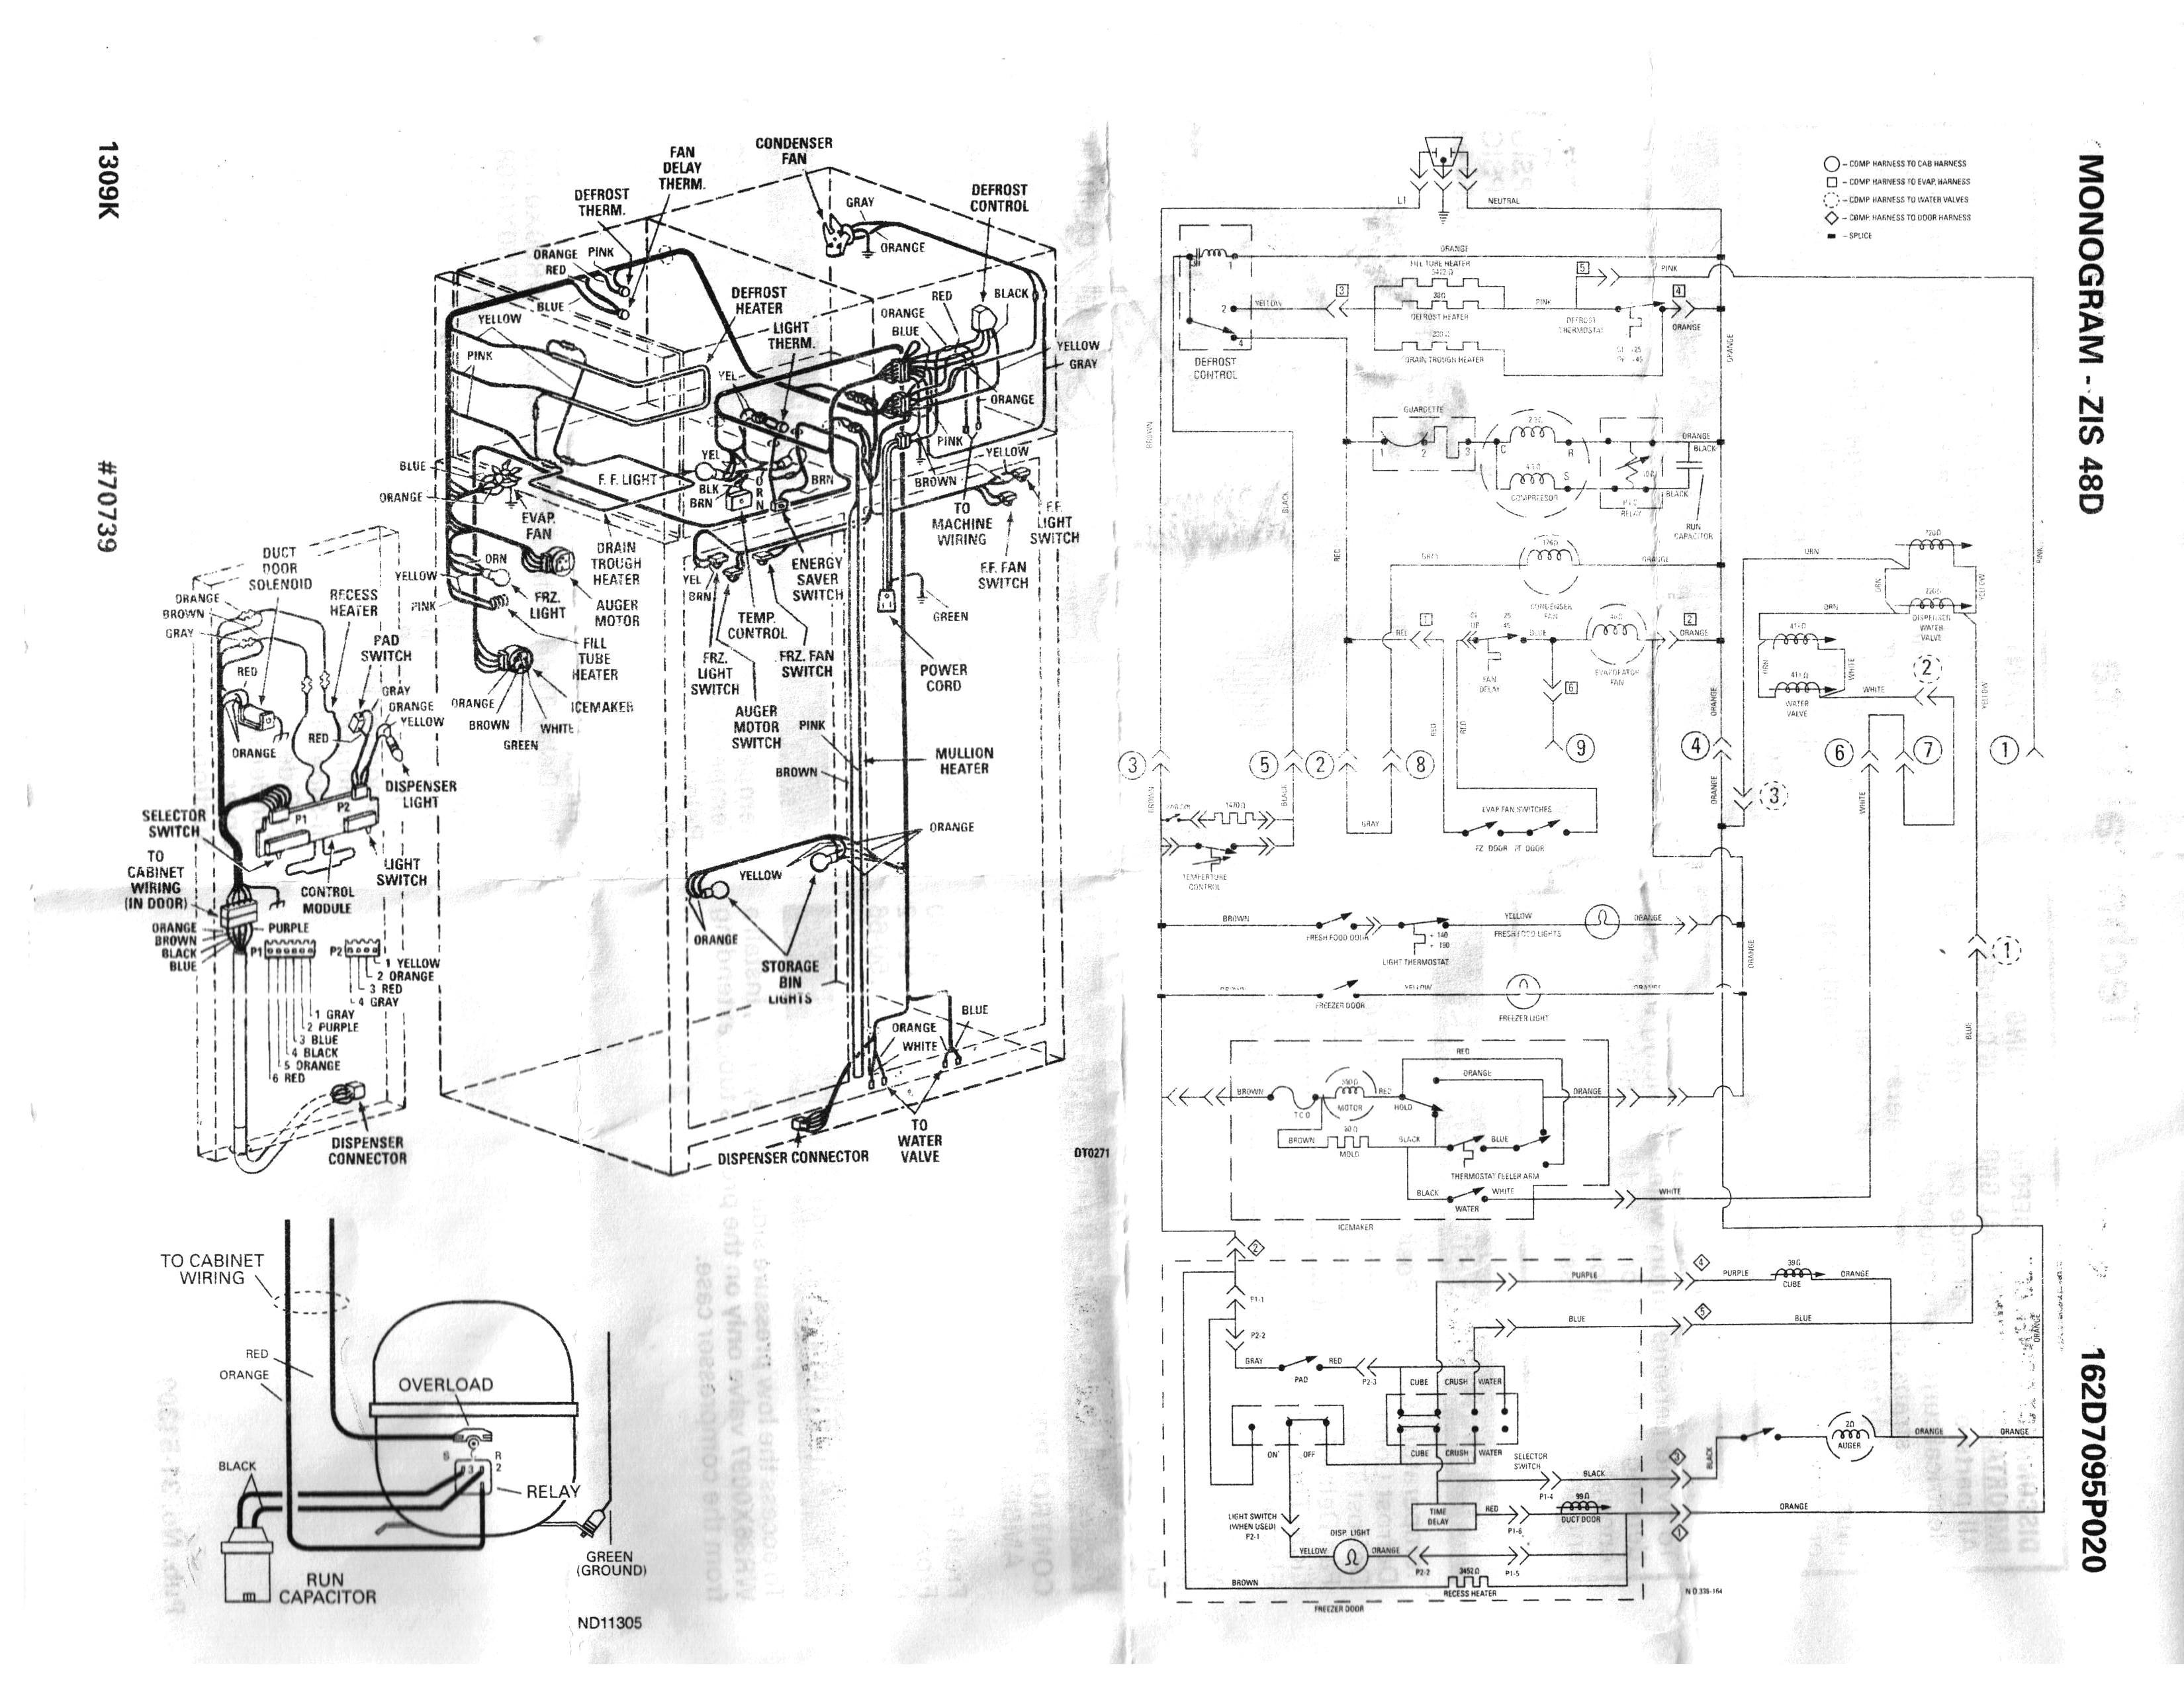 Pss26 Ge Refrigerator Wiring Diagram | Online Wiring Diagram on